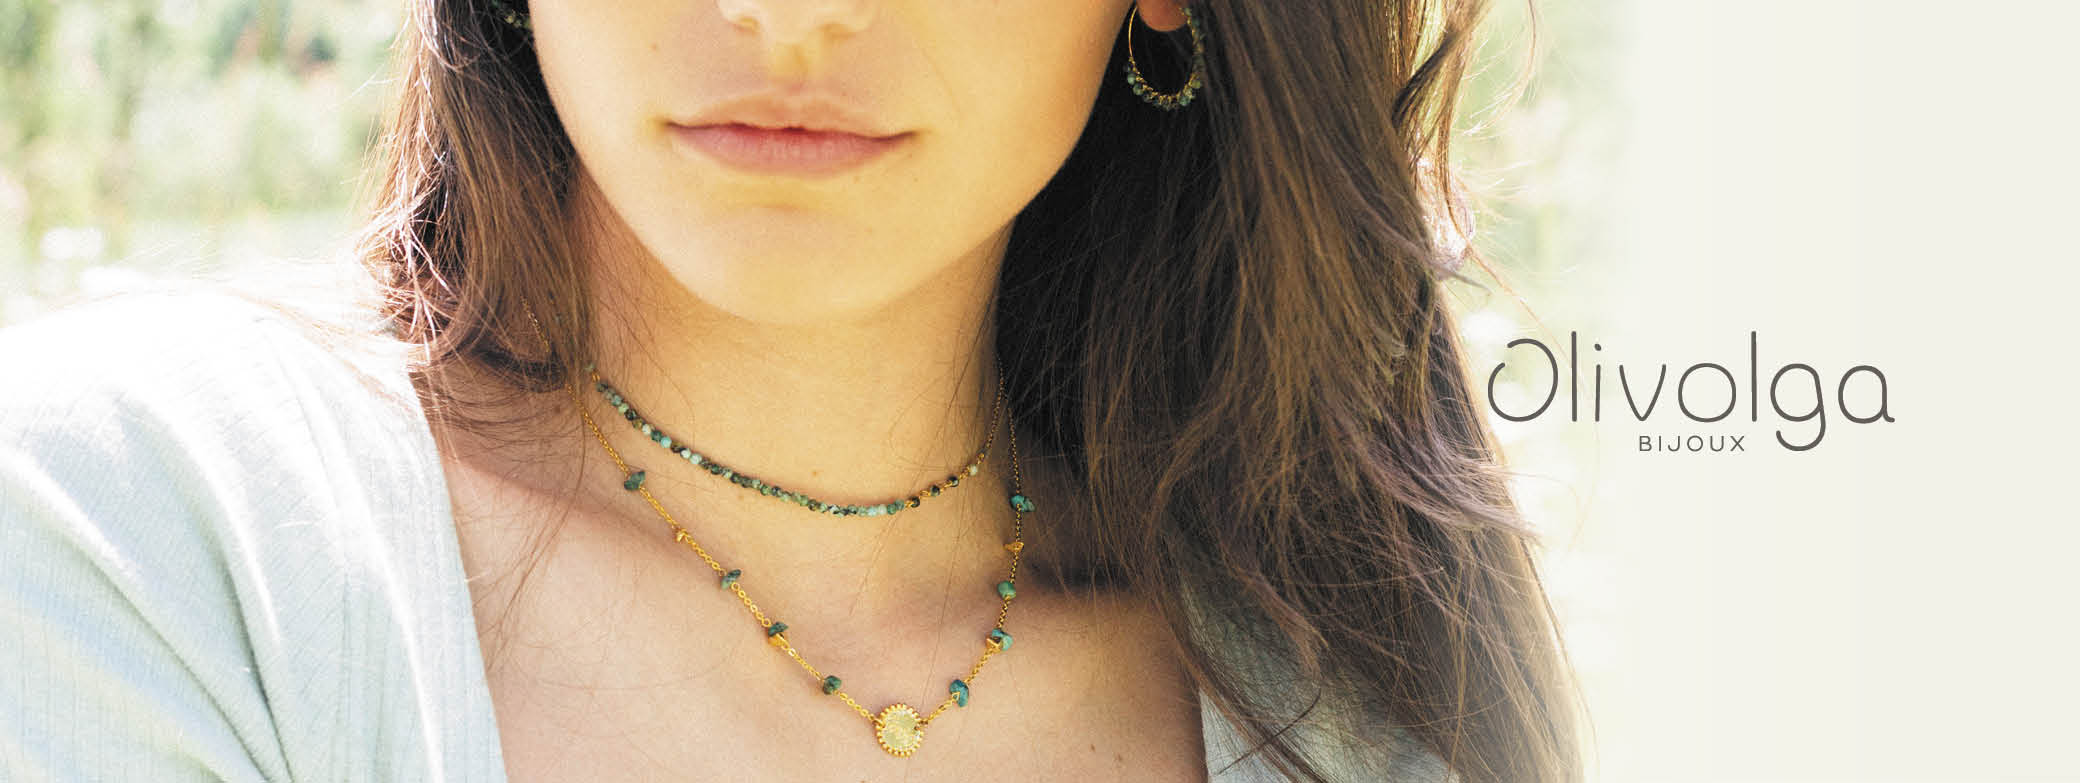 Olivolga Bijoux - Nouveautés bijoux